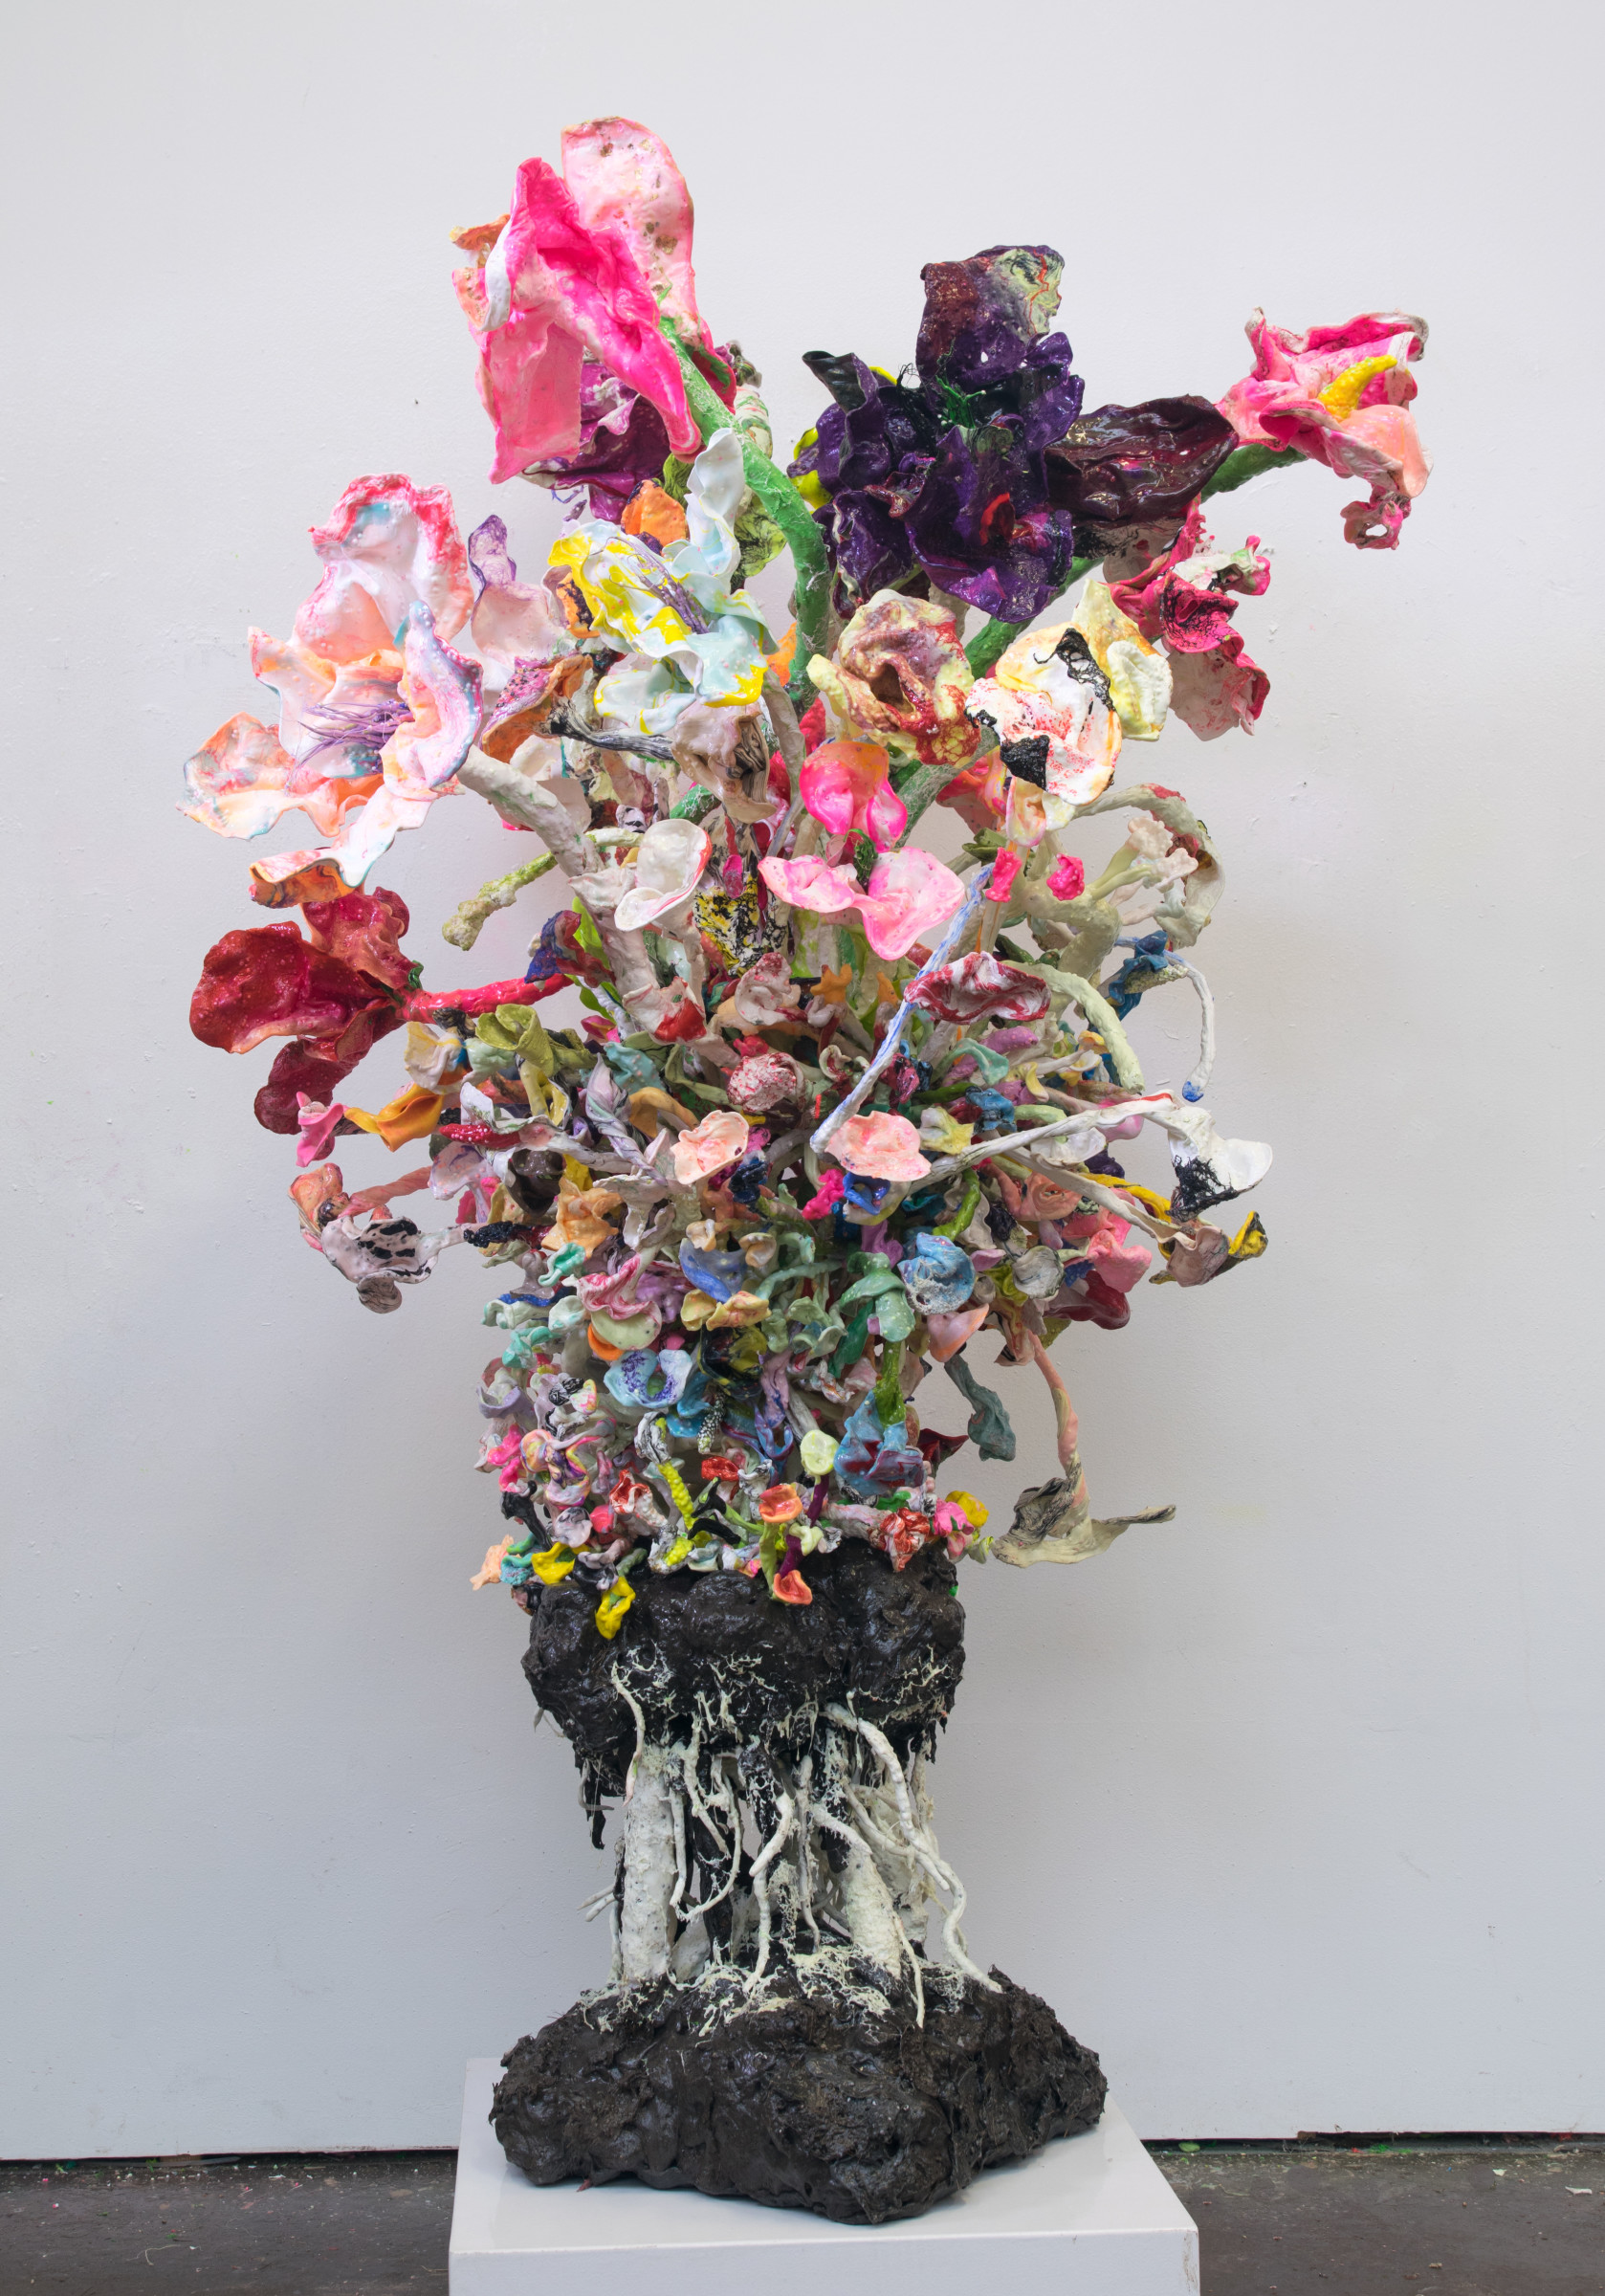 "<span class=""link fancybox-details-link""><a href=""/artists/42-stefan-gross/works/5351-stefan-gross-stranger-flowers-vii-2019/"">View Detail Page</a></span><div class=""artist""><strong>Stefan Gross</strong></div> <div class=""title""><em>Stranger Flowers - VII</em>, 2019</div> <div class=""medium"">Oil Plastic</div> <div class=""dimensions"">180 x 90 x 90 cm</div><div class=""price"">€21,000.00</div>"